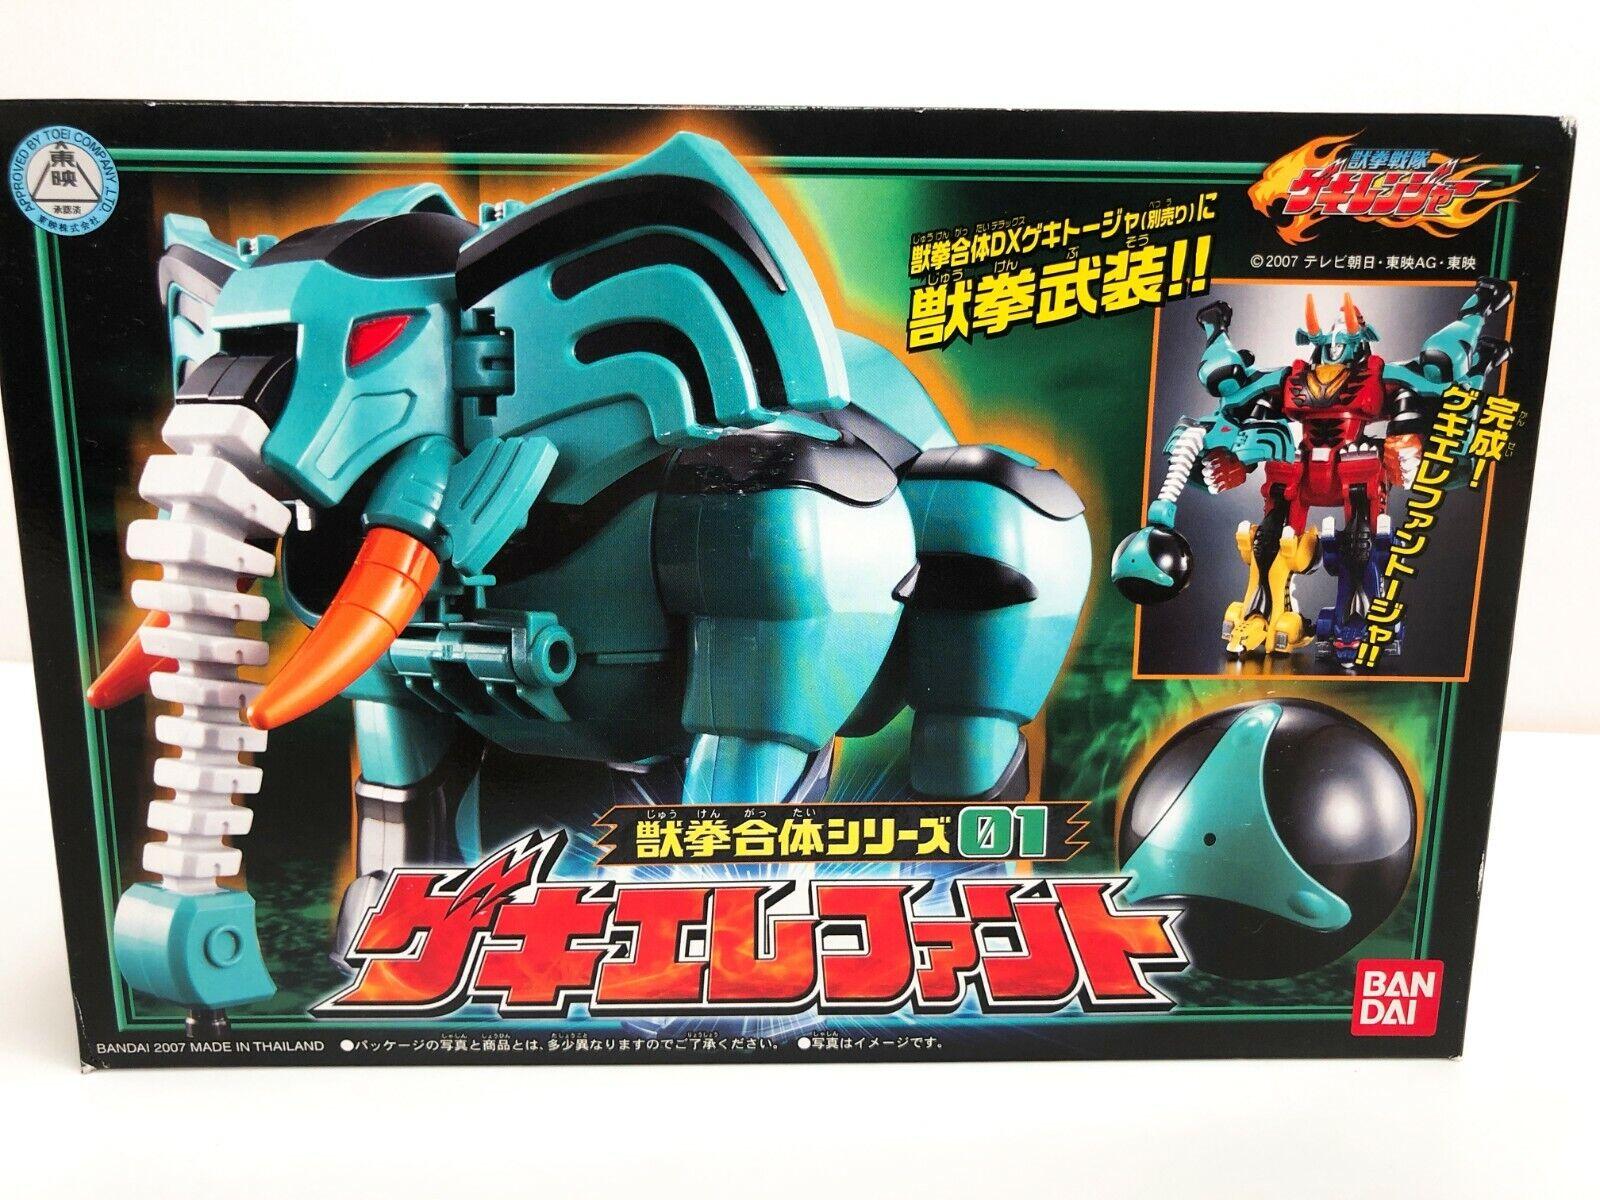 Gekiranger Juken Sentai Jungle Fury Dx Bandai Saiblade Geki